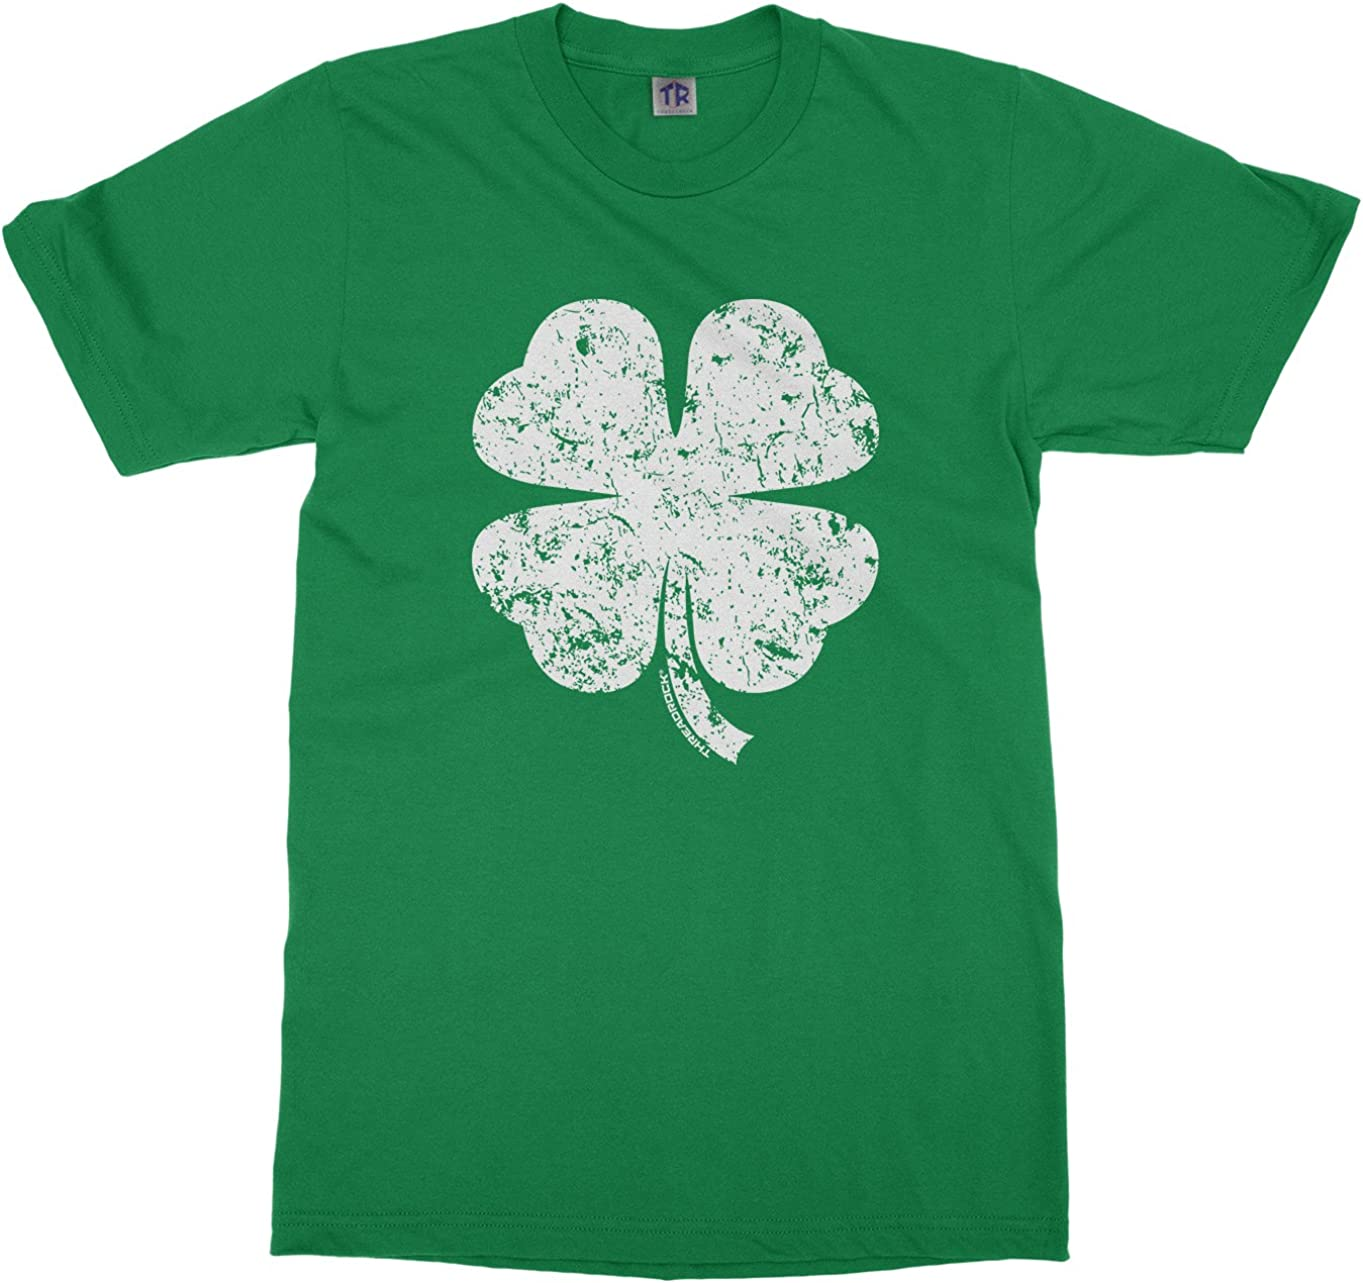 boys 10//12 green THIS IS MY LUCKY SHIRT top tee clover cotton short sleeve @@